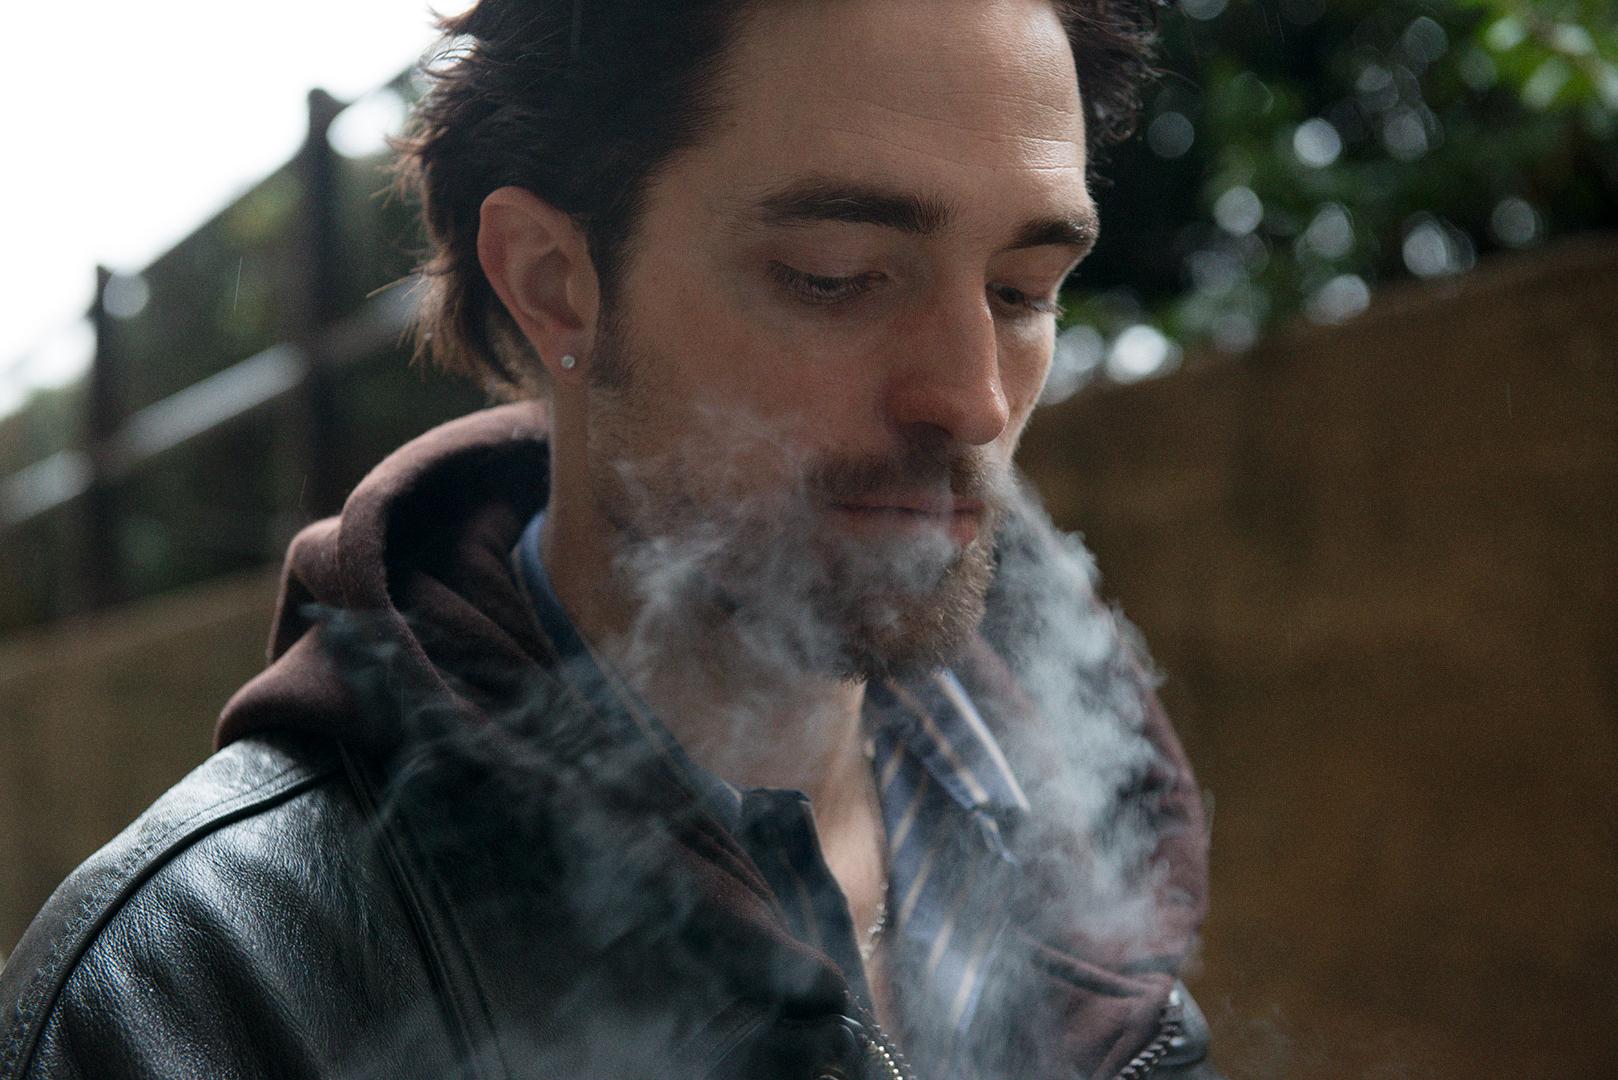 Robert Pattinson, on the set of Good Time